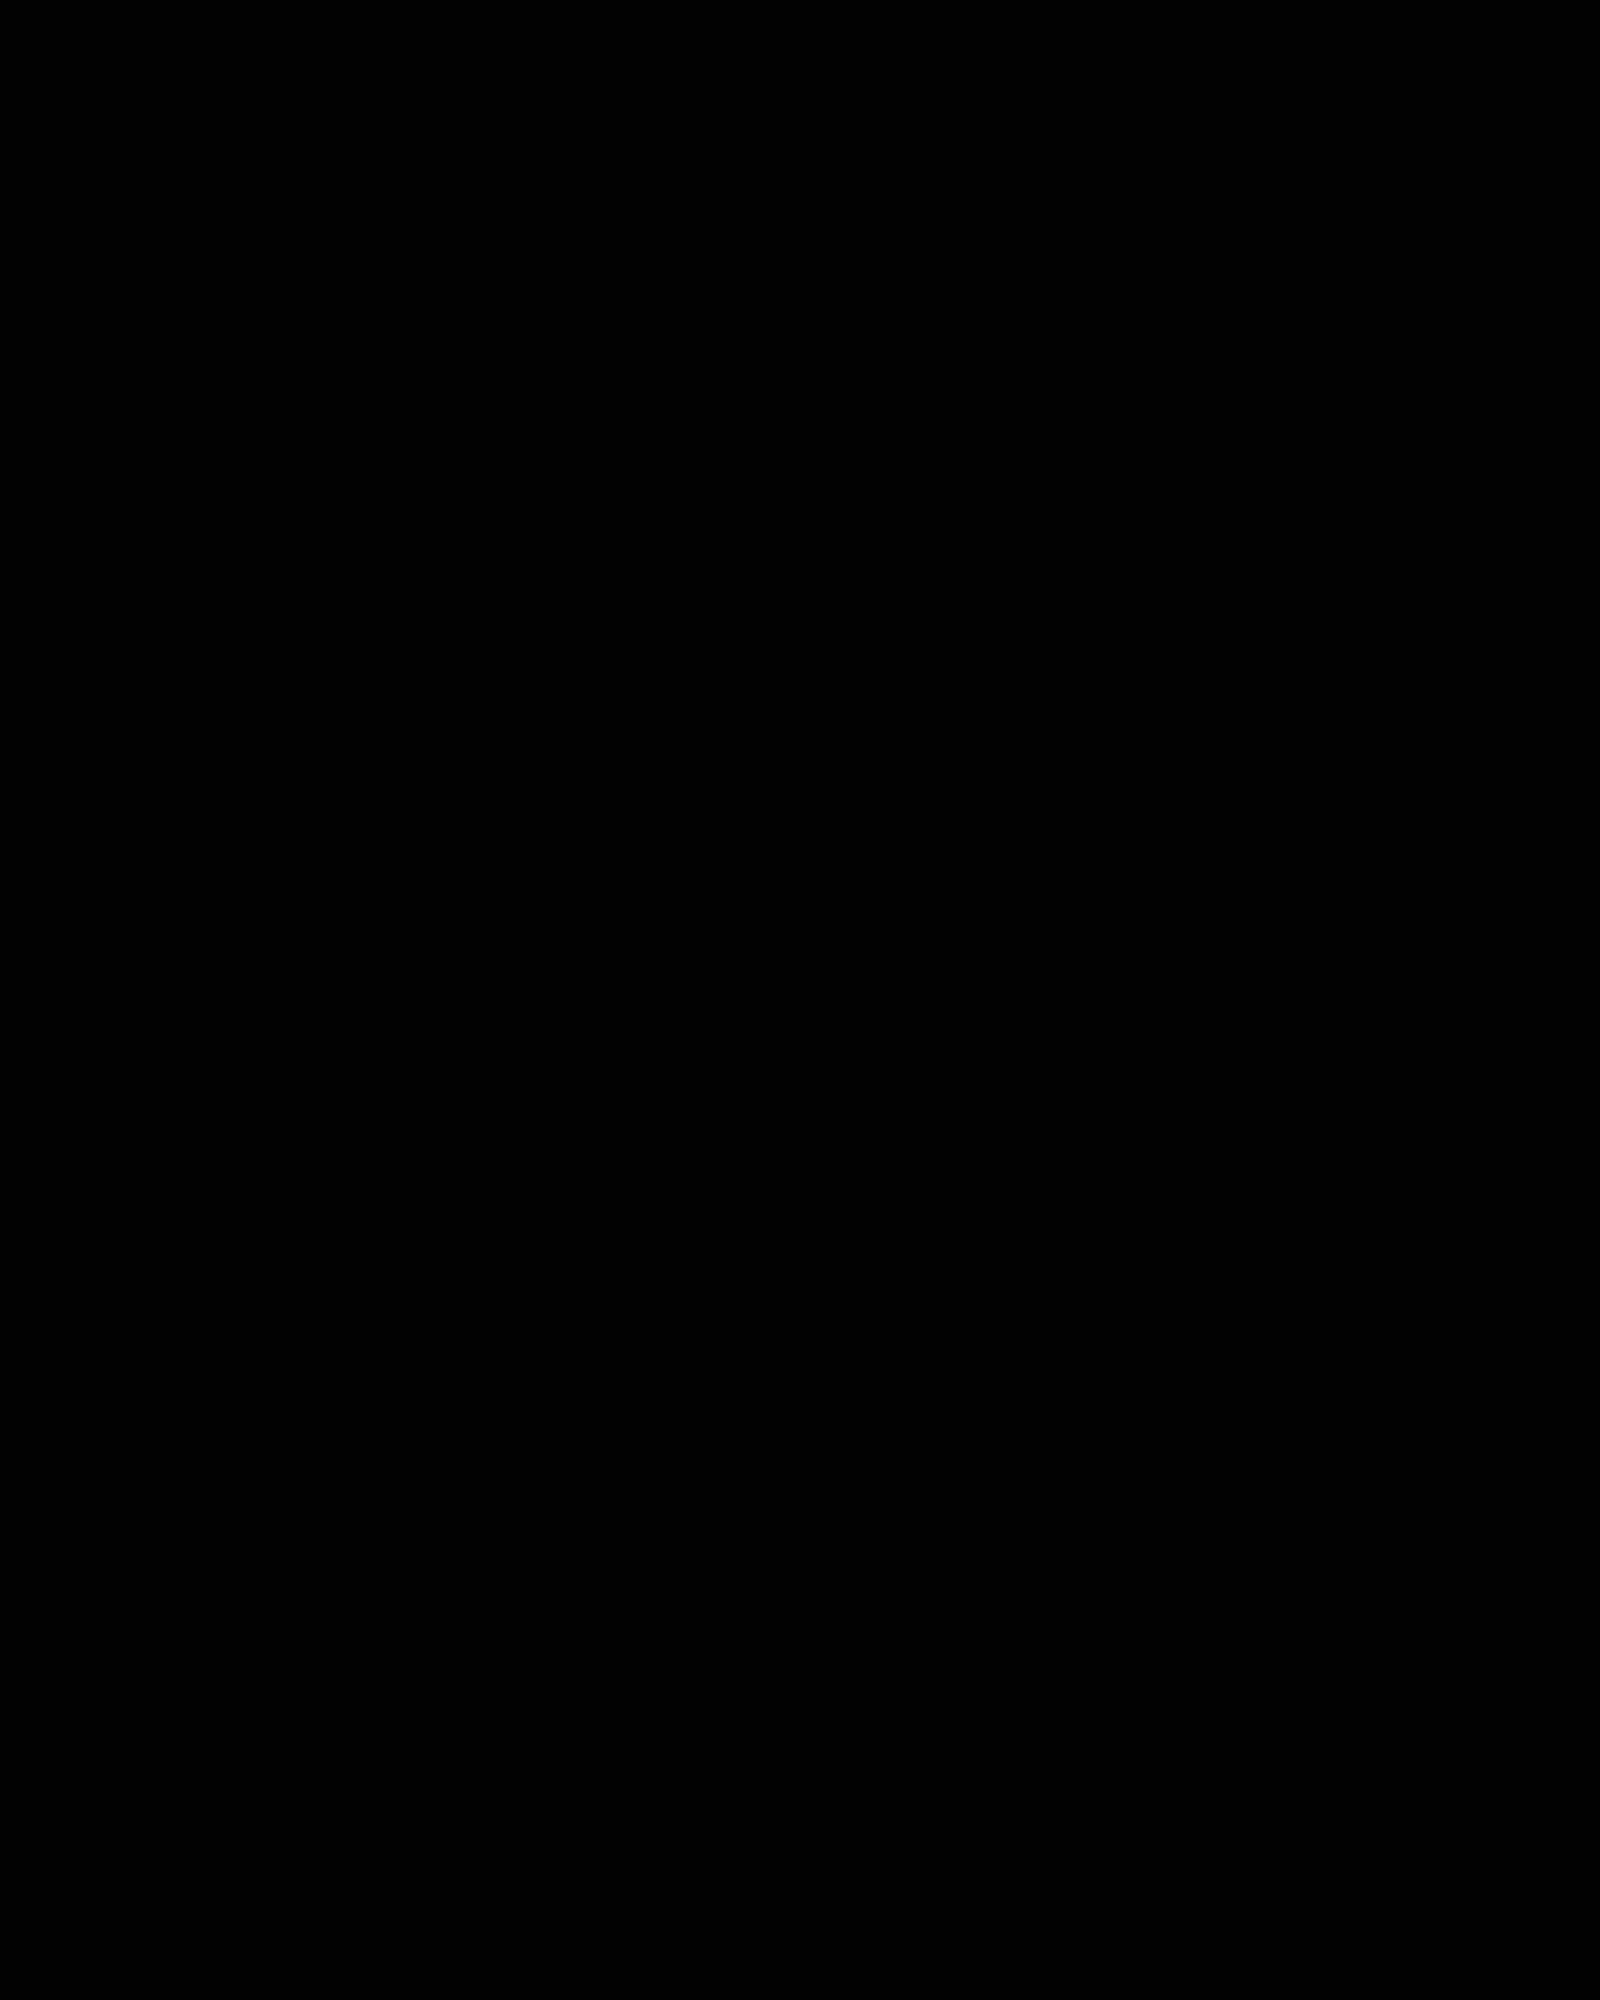 Grid Png Transparent Pic